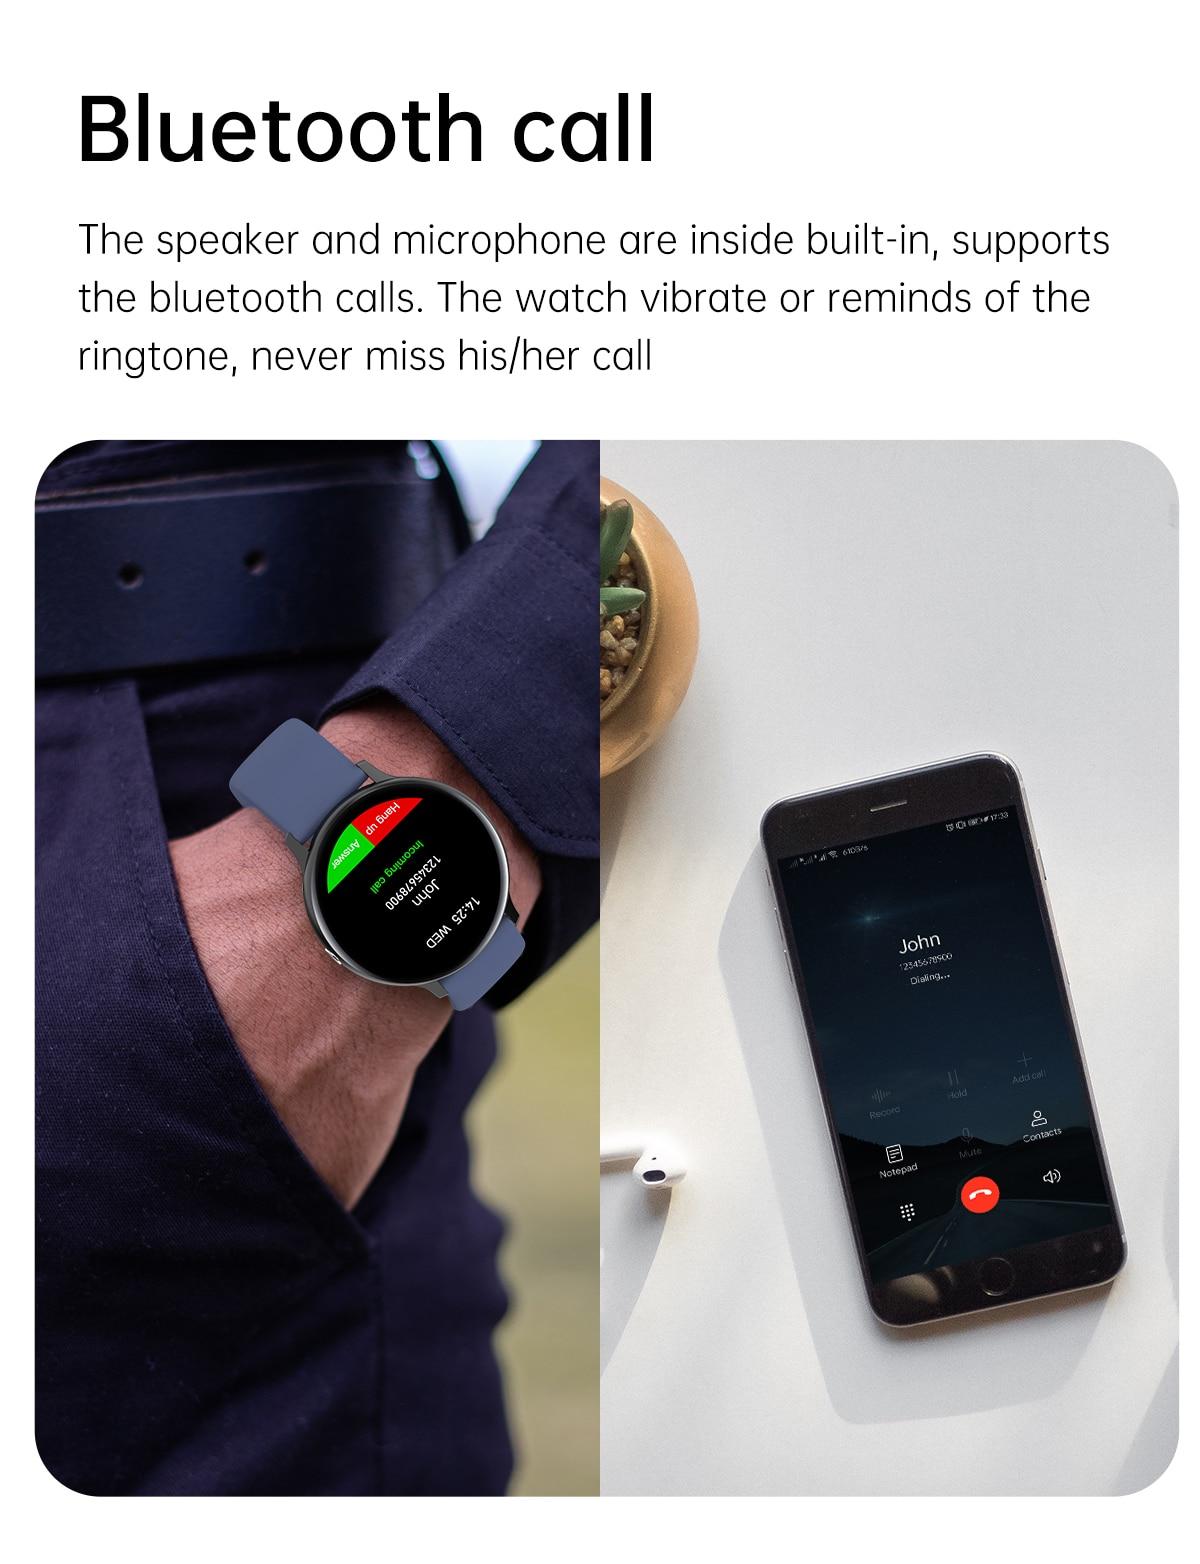 H068e7cb4d29c47dba1ef762d7eb1e6e3q LIGE 2021 New Bluetooth call smart watch men women Sport mode Heart rate and blood pressure monitor Activity tracker Smartwatch